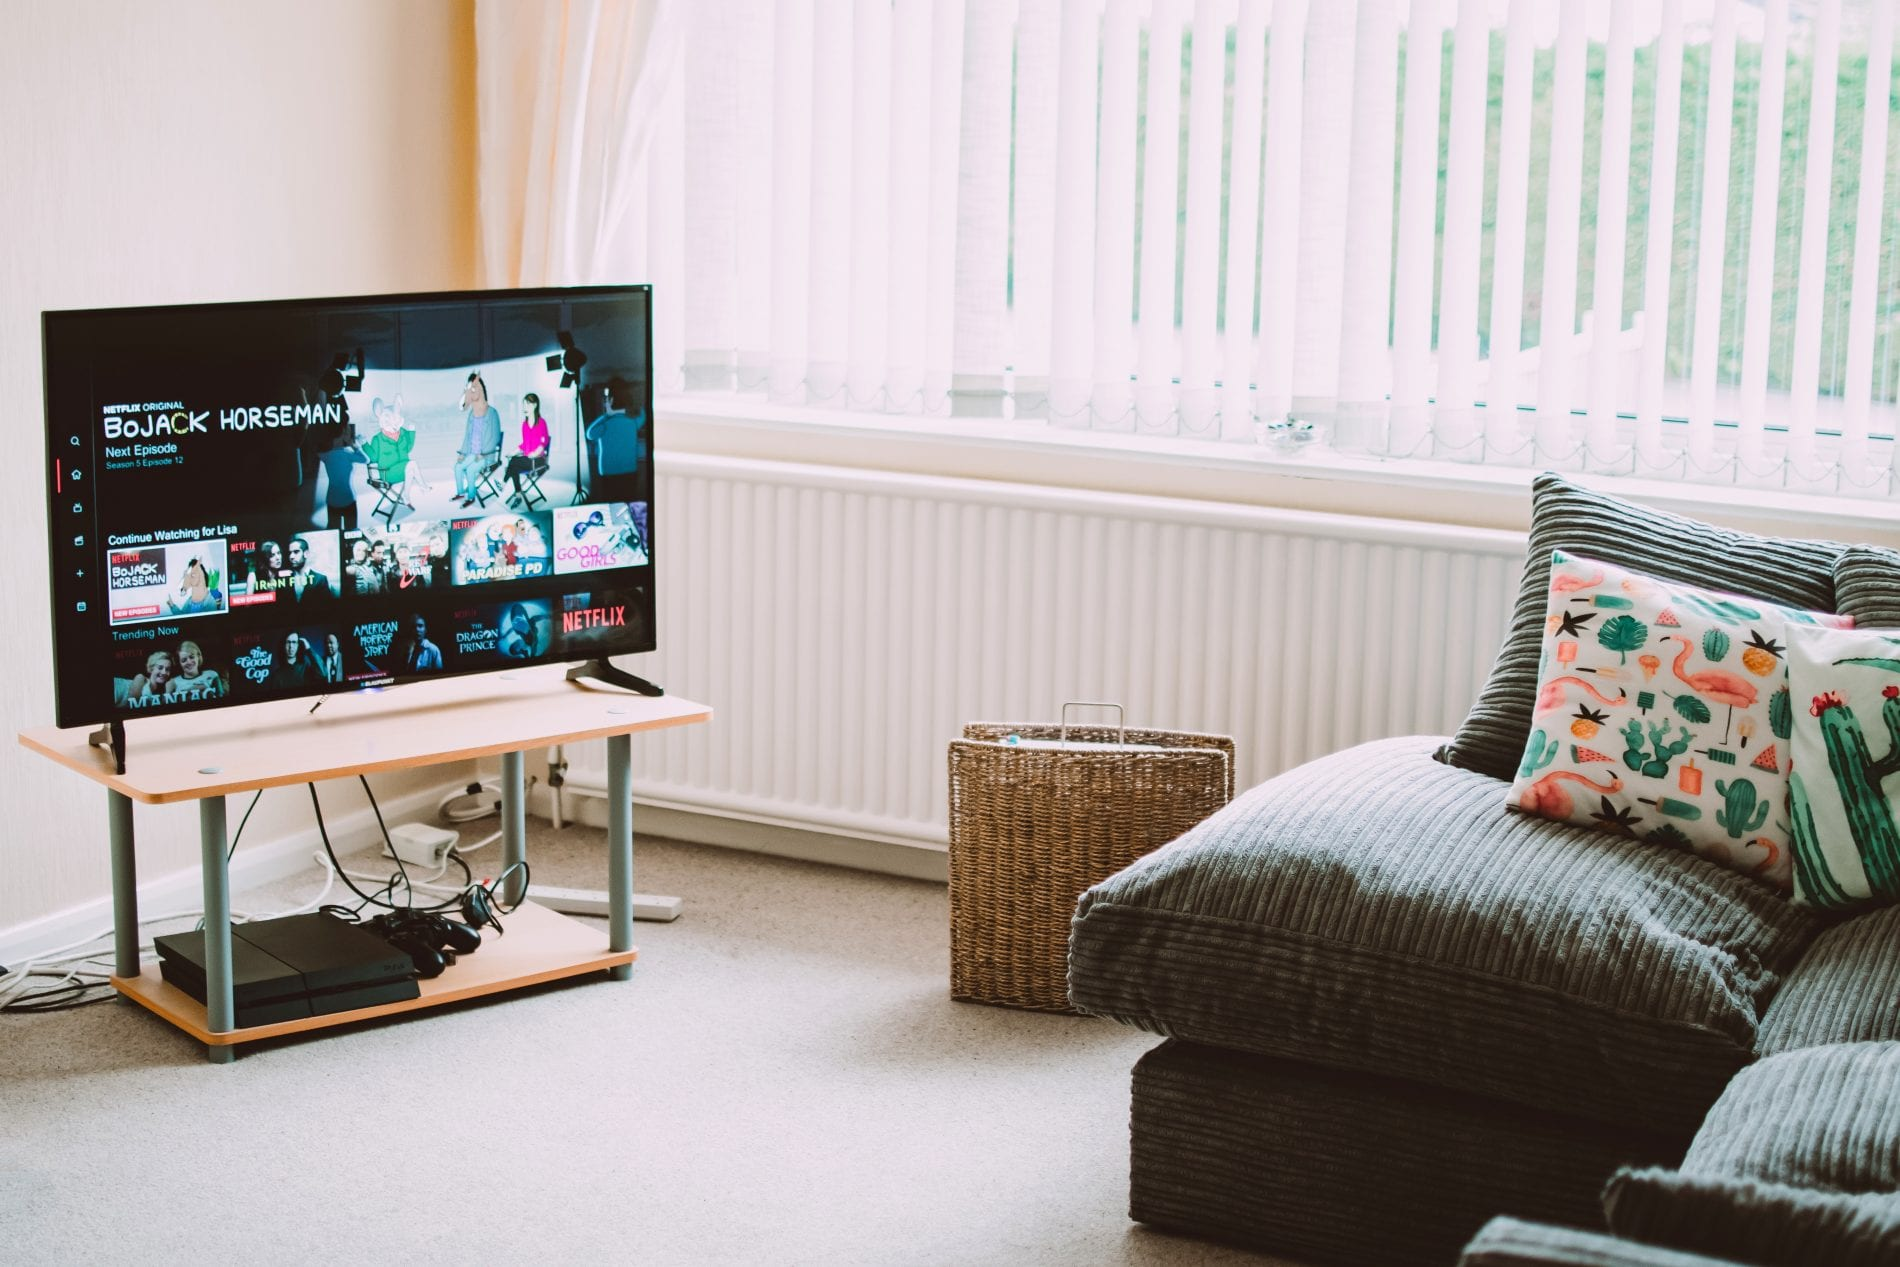 Vectra-Multimedia-Polska-transakcja-telewizja-kablowa